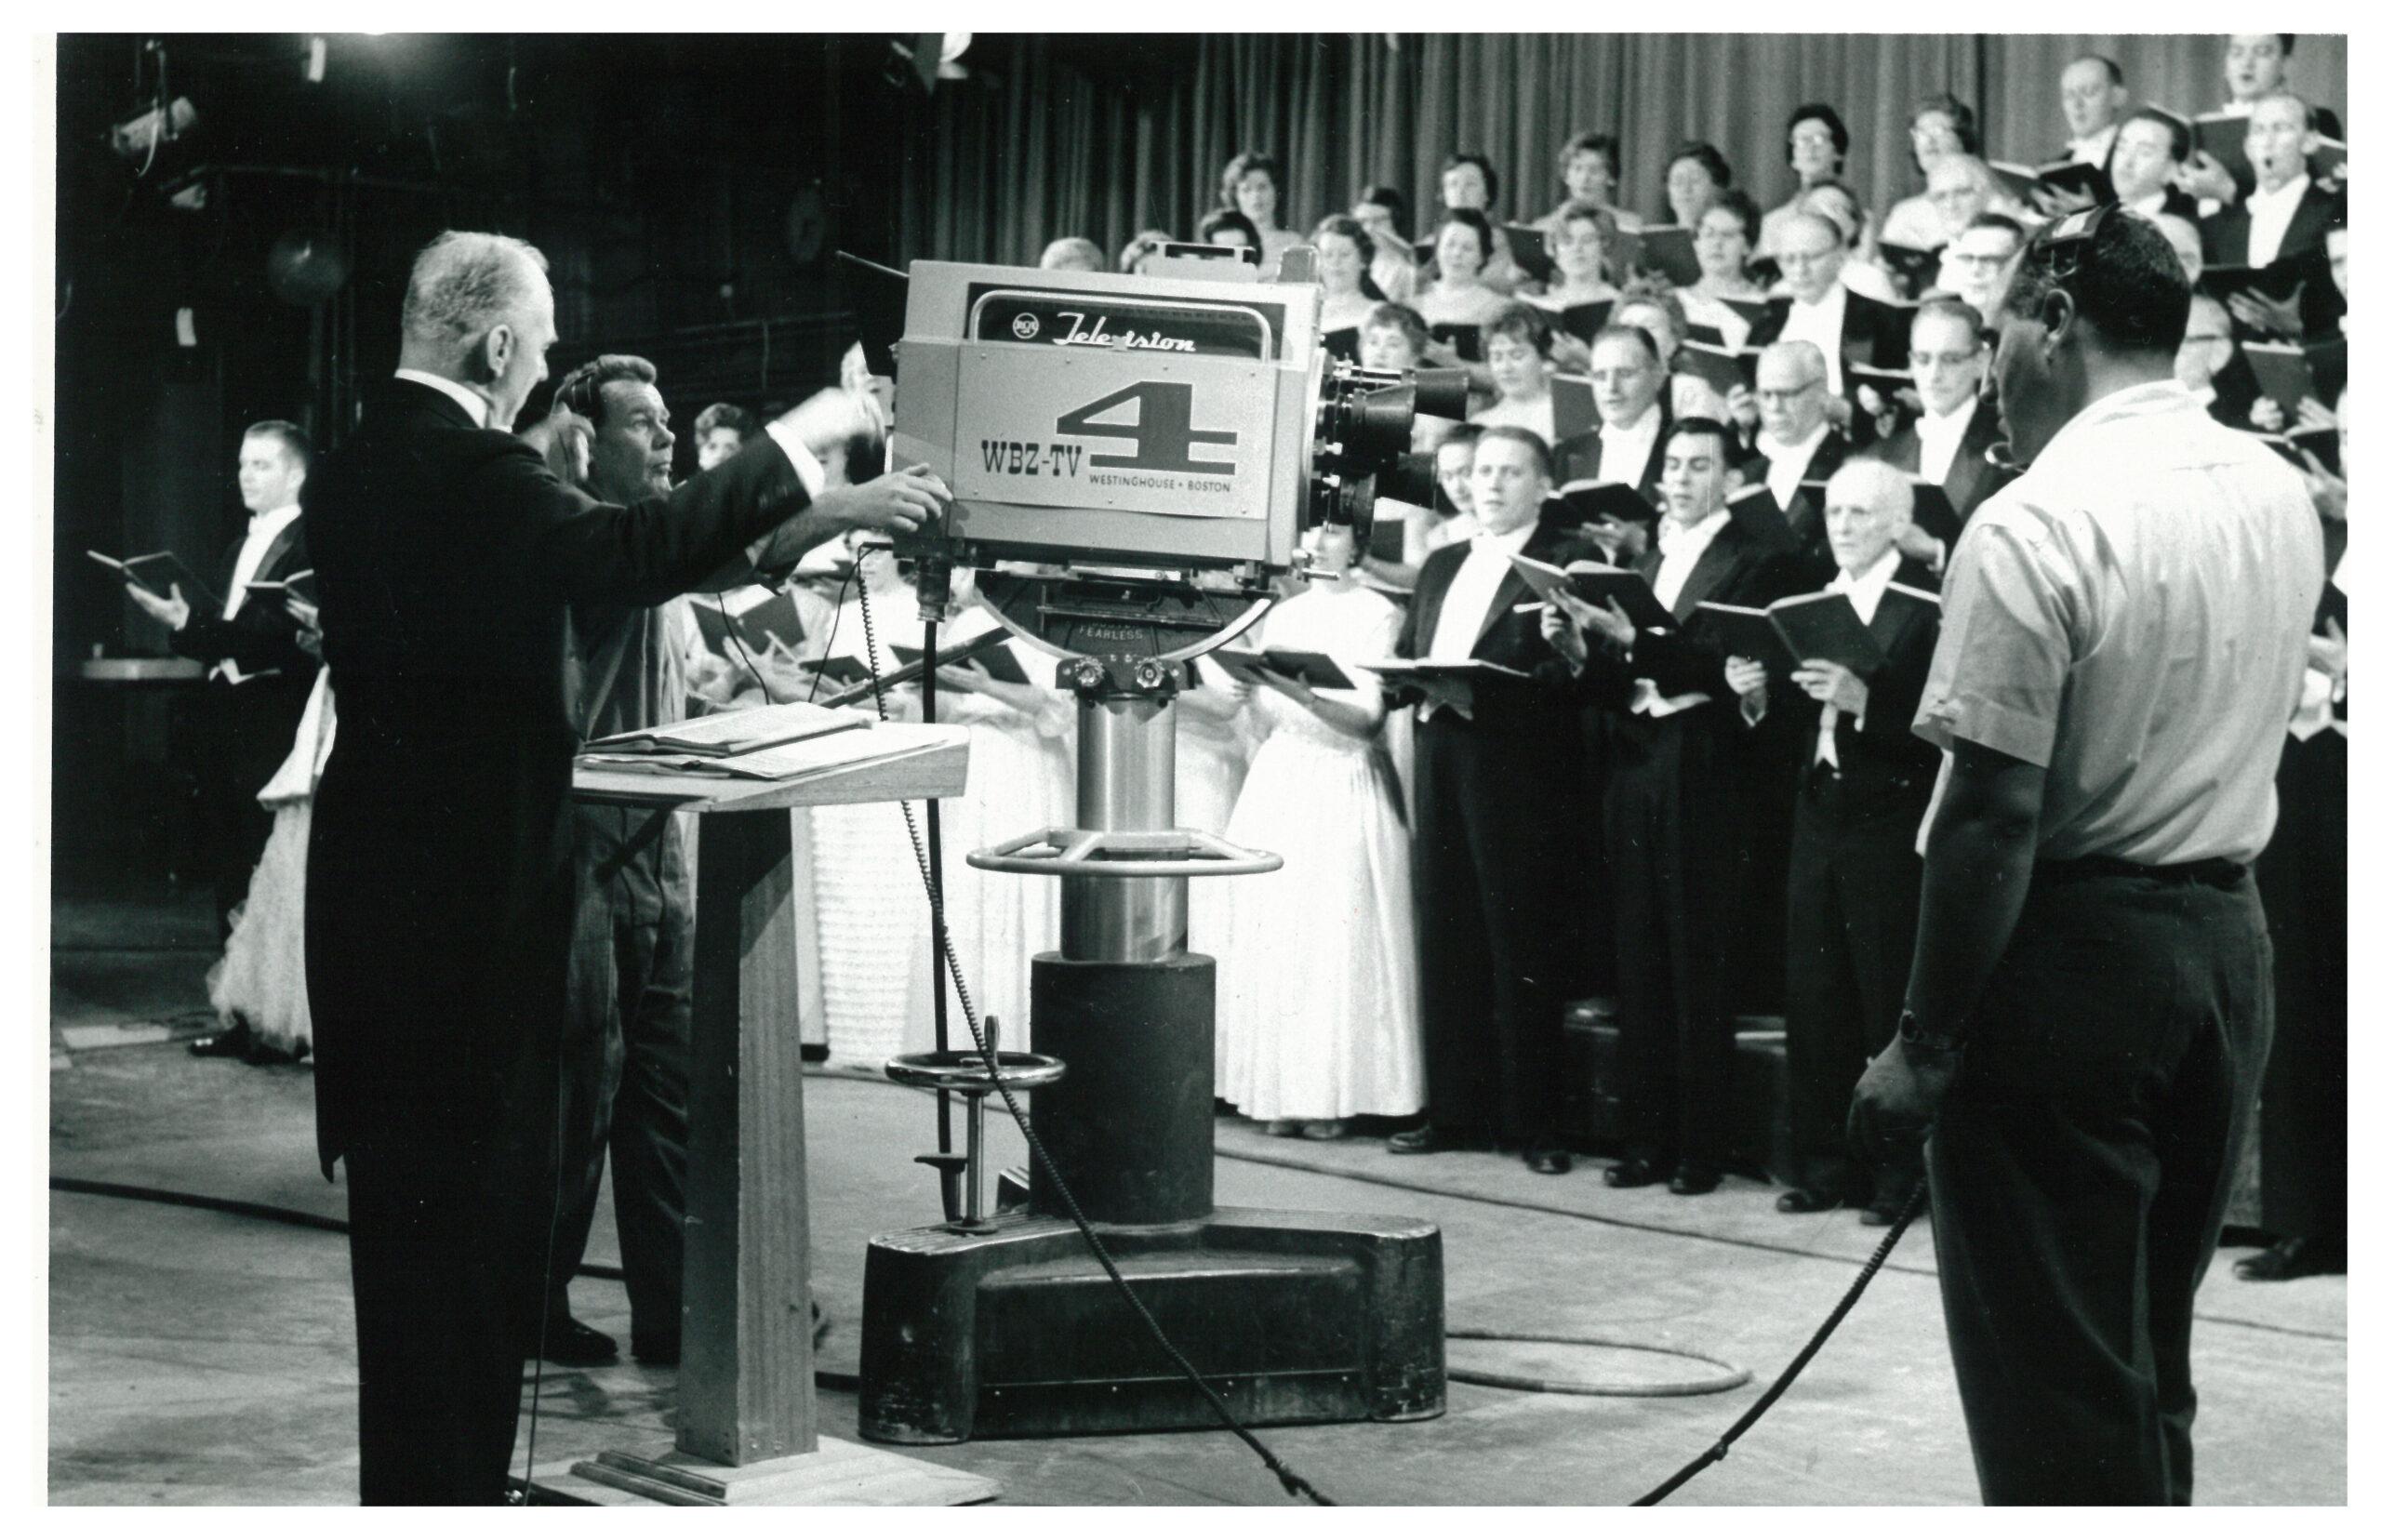 H+H singing Messiah on TV in 1961